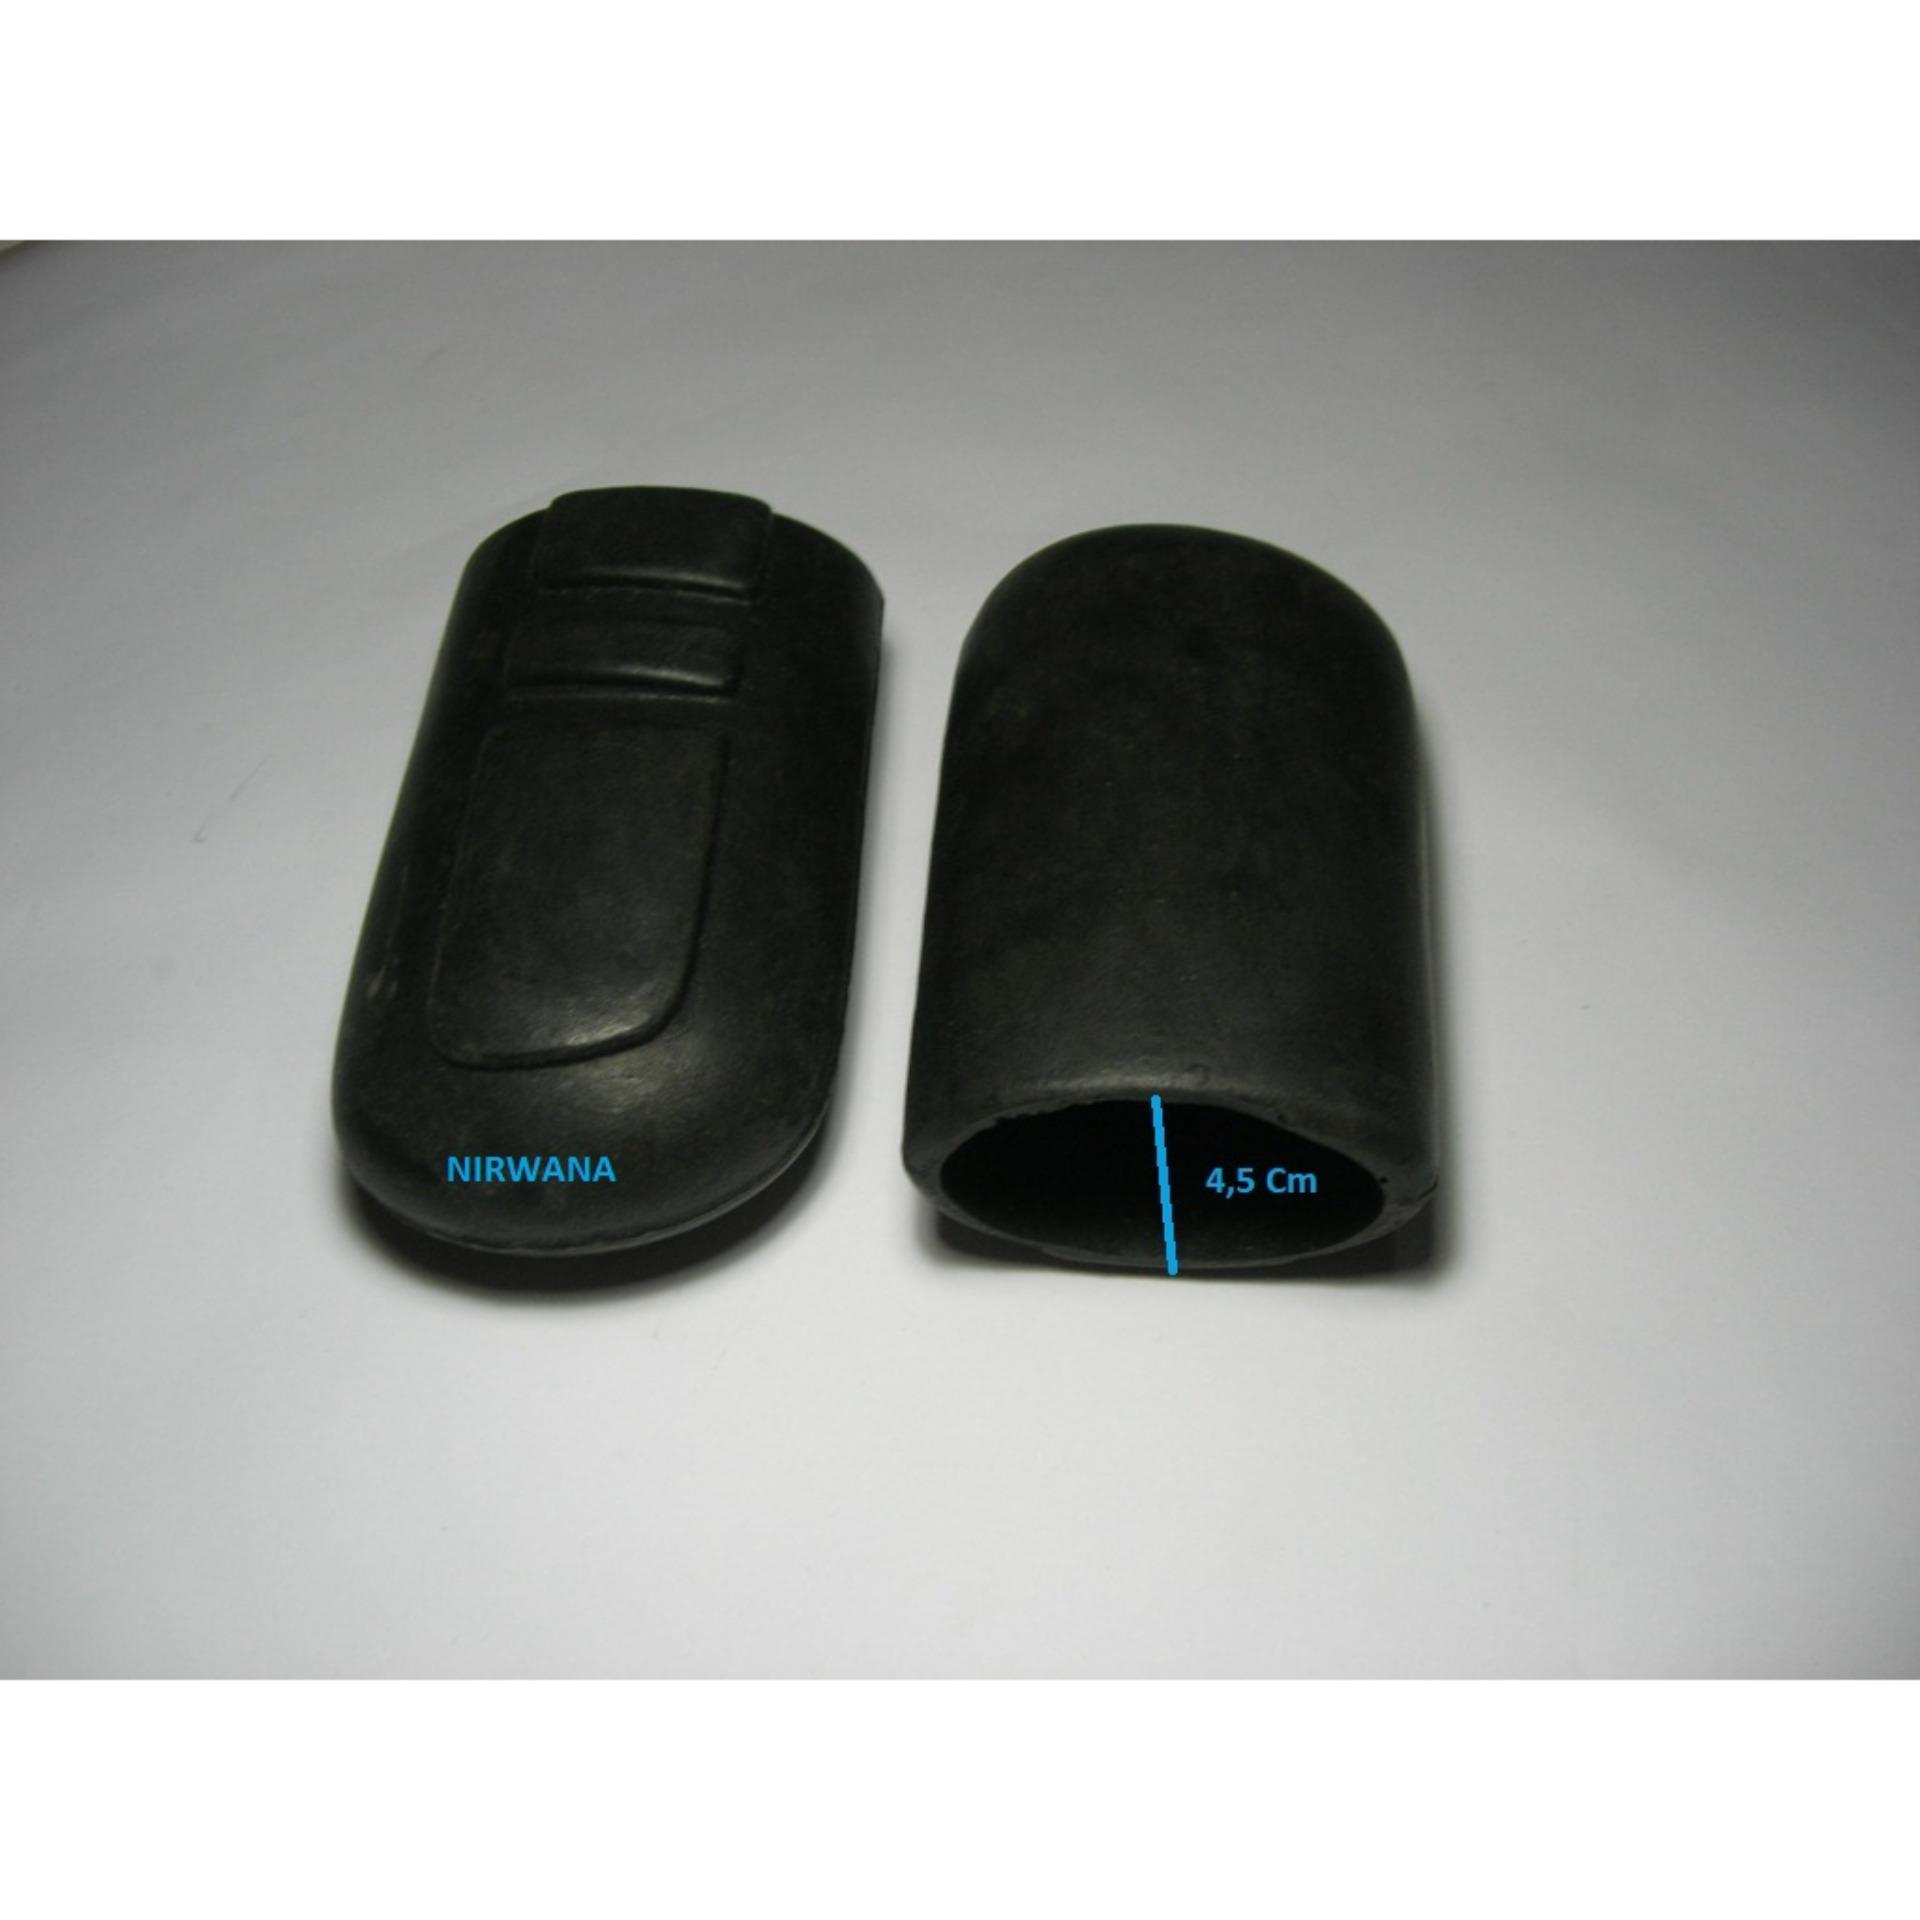 Jual Desa Kustompart Tangki Motor Custom Tear Drop Mini Diskon Source · Daihatsu Tutup Bumper Belakang Polos Universal Model Oval 2 Biji